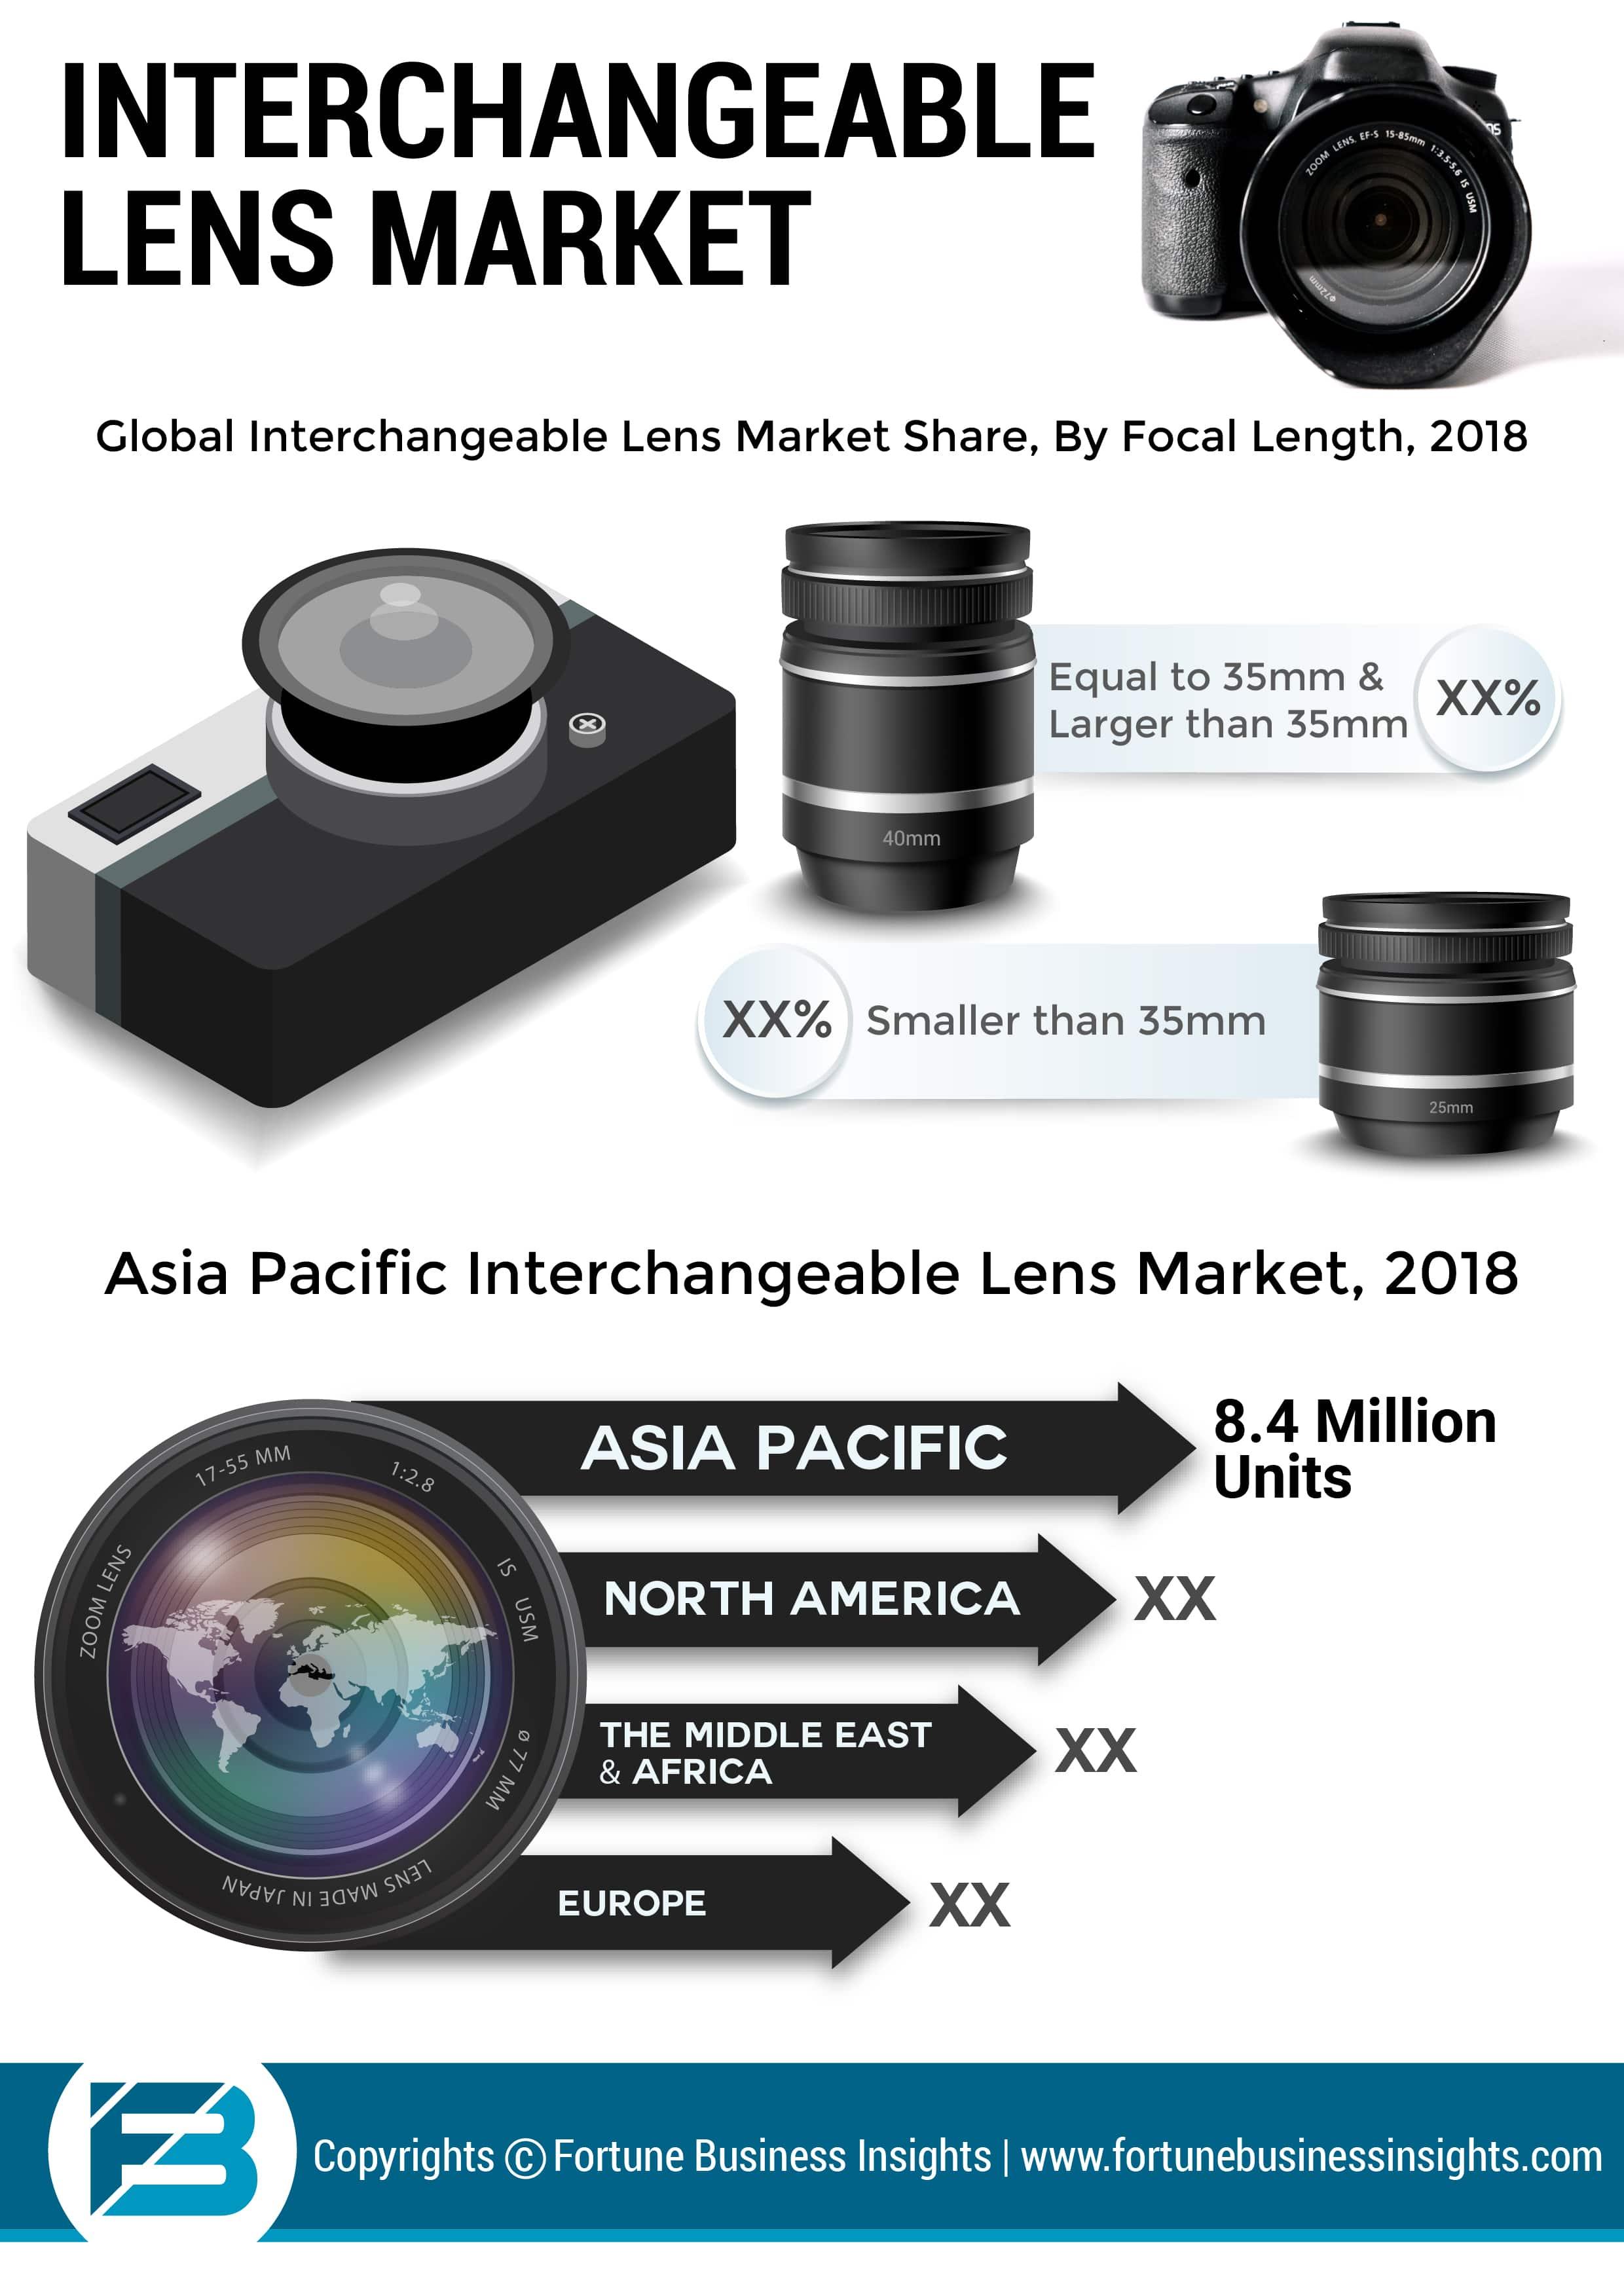 Interchangeable Lens Market